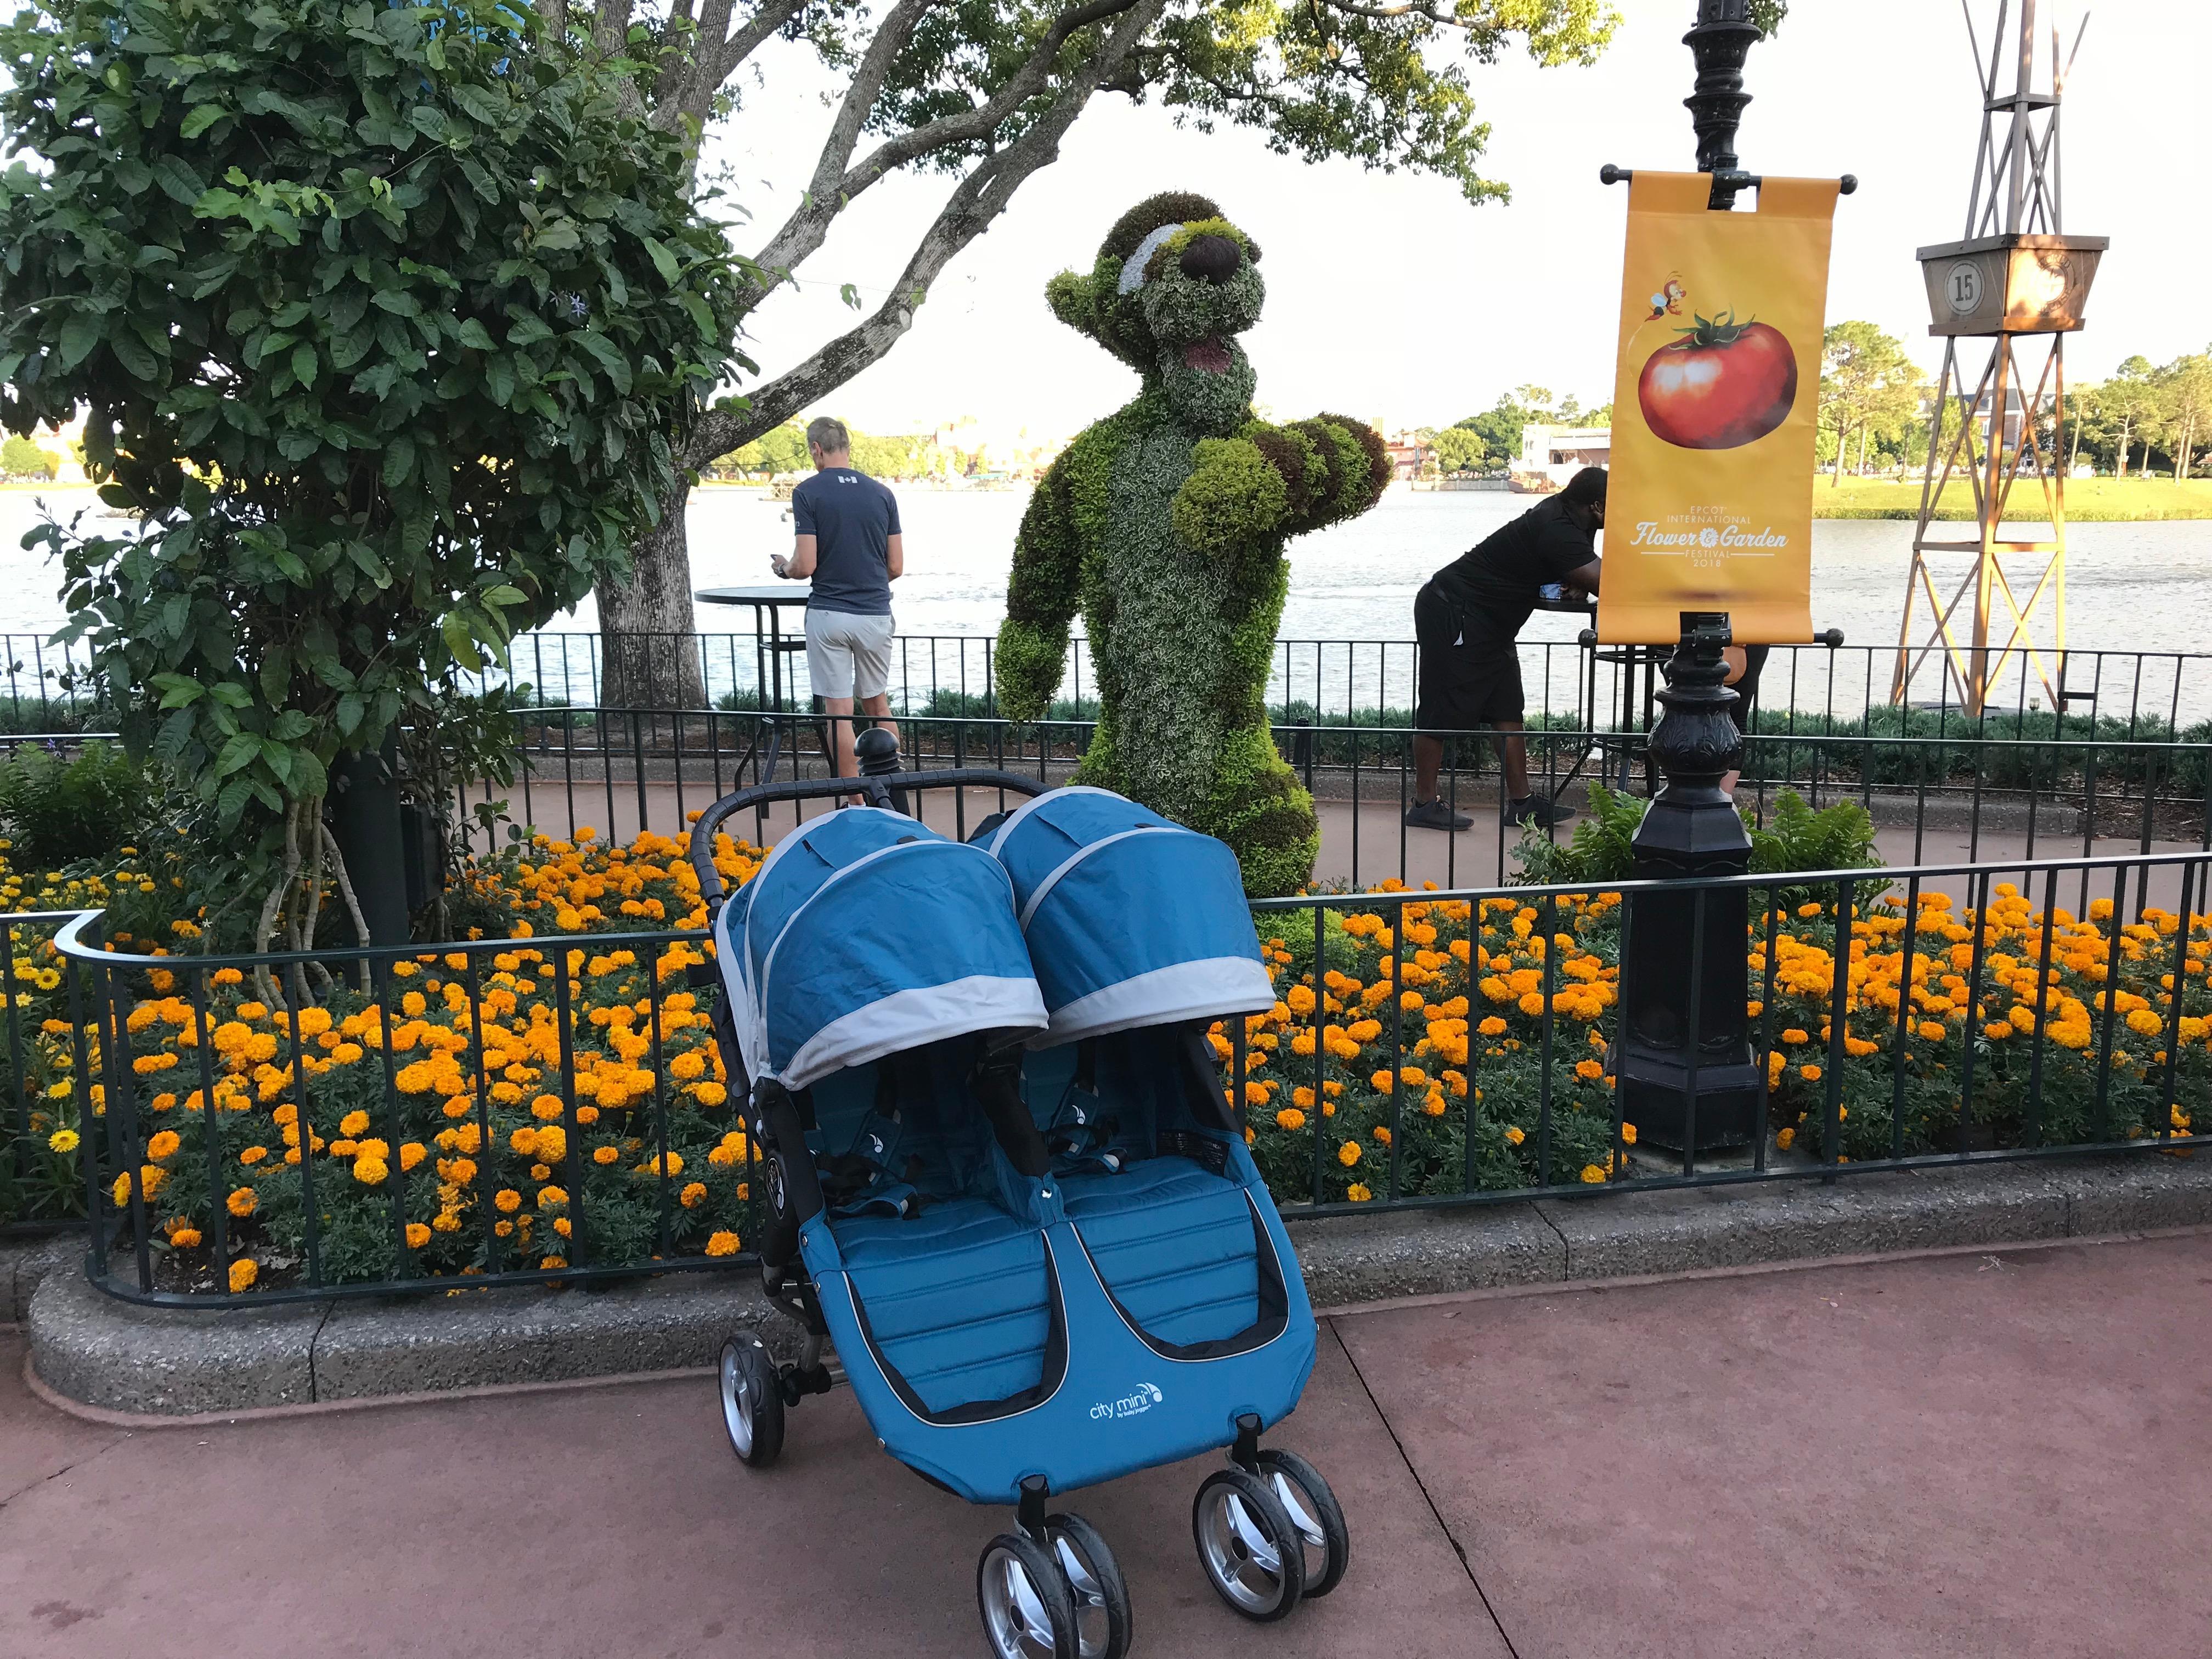 Stroller Rentals Disney image 26